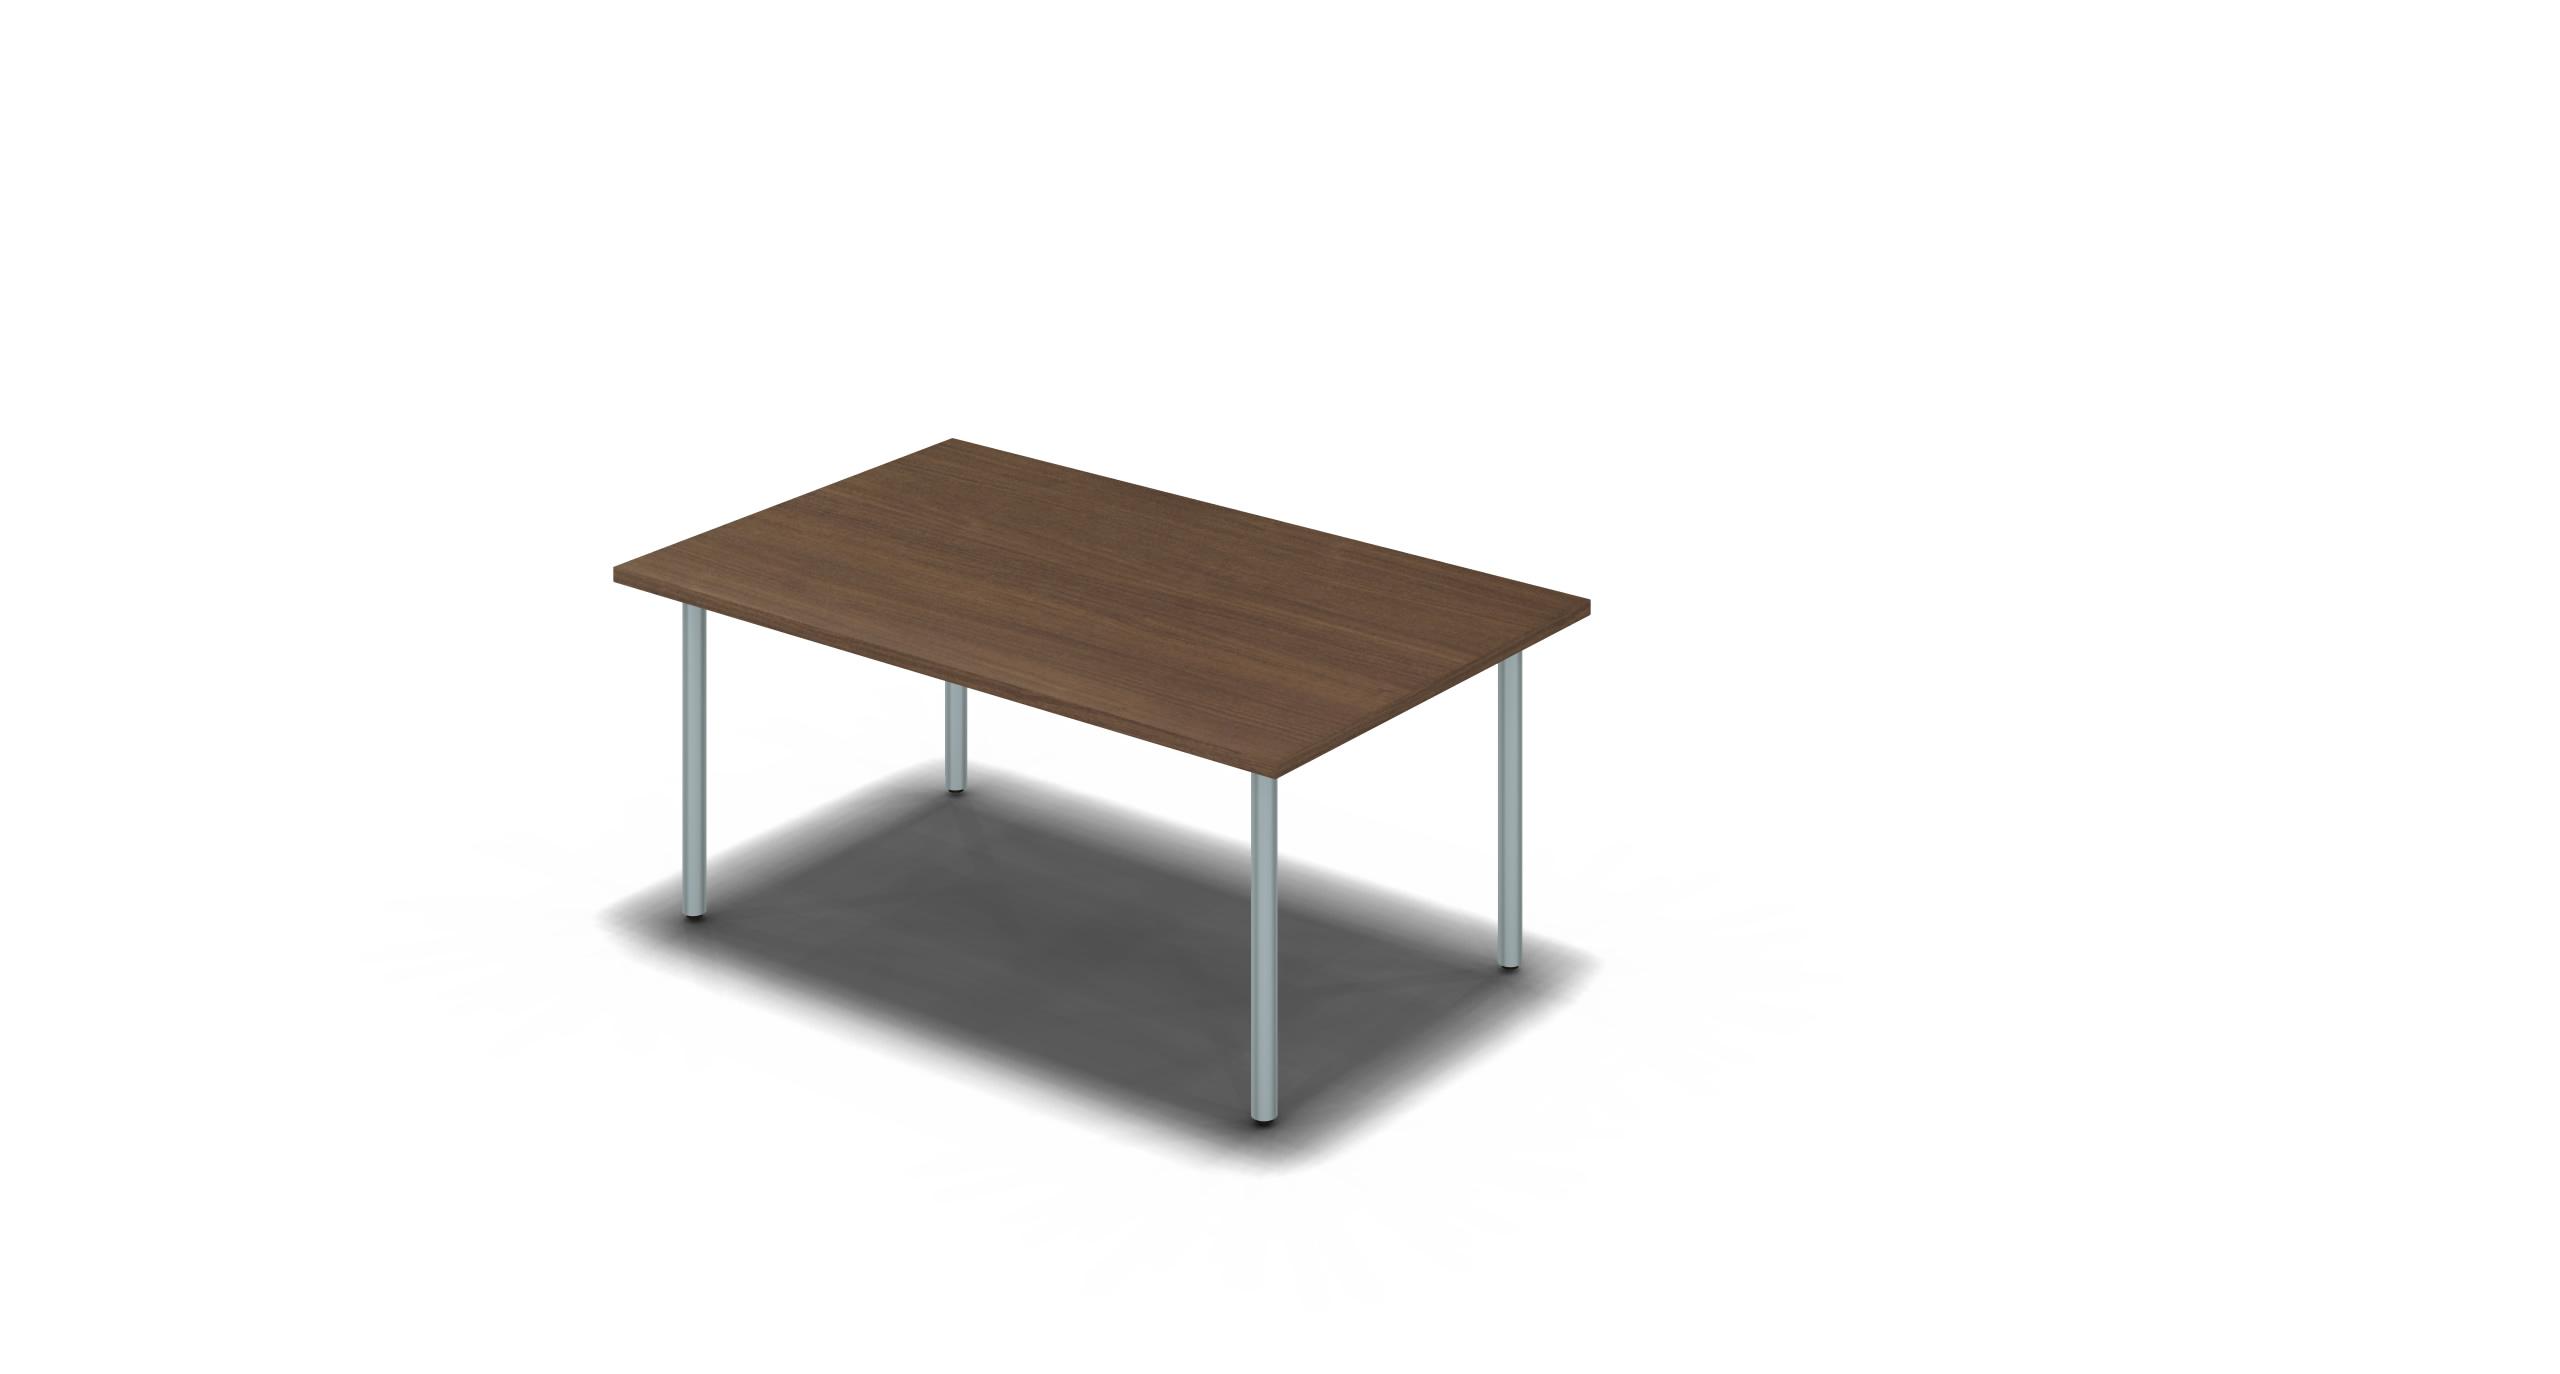 Table_Round_1500x900_Silver_Walnut_noOption